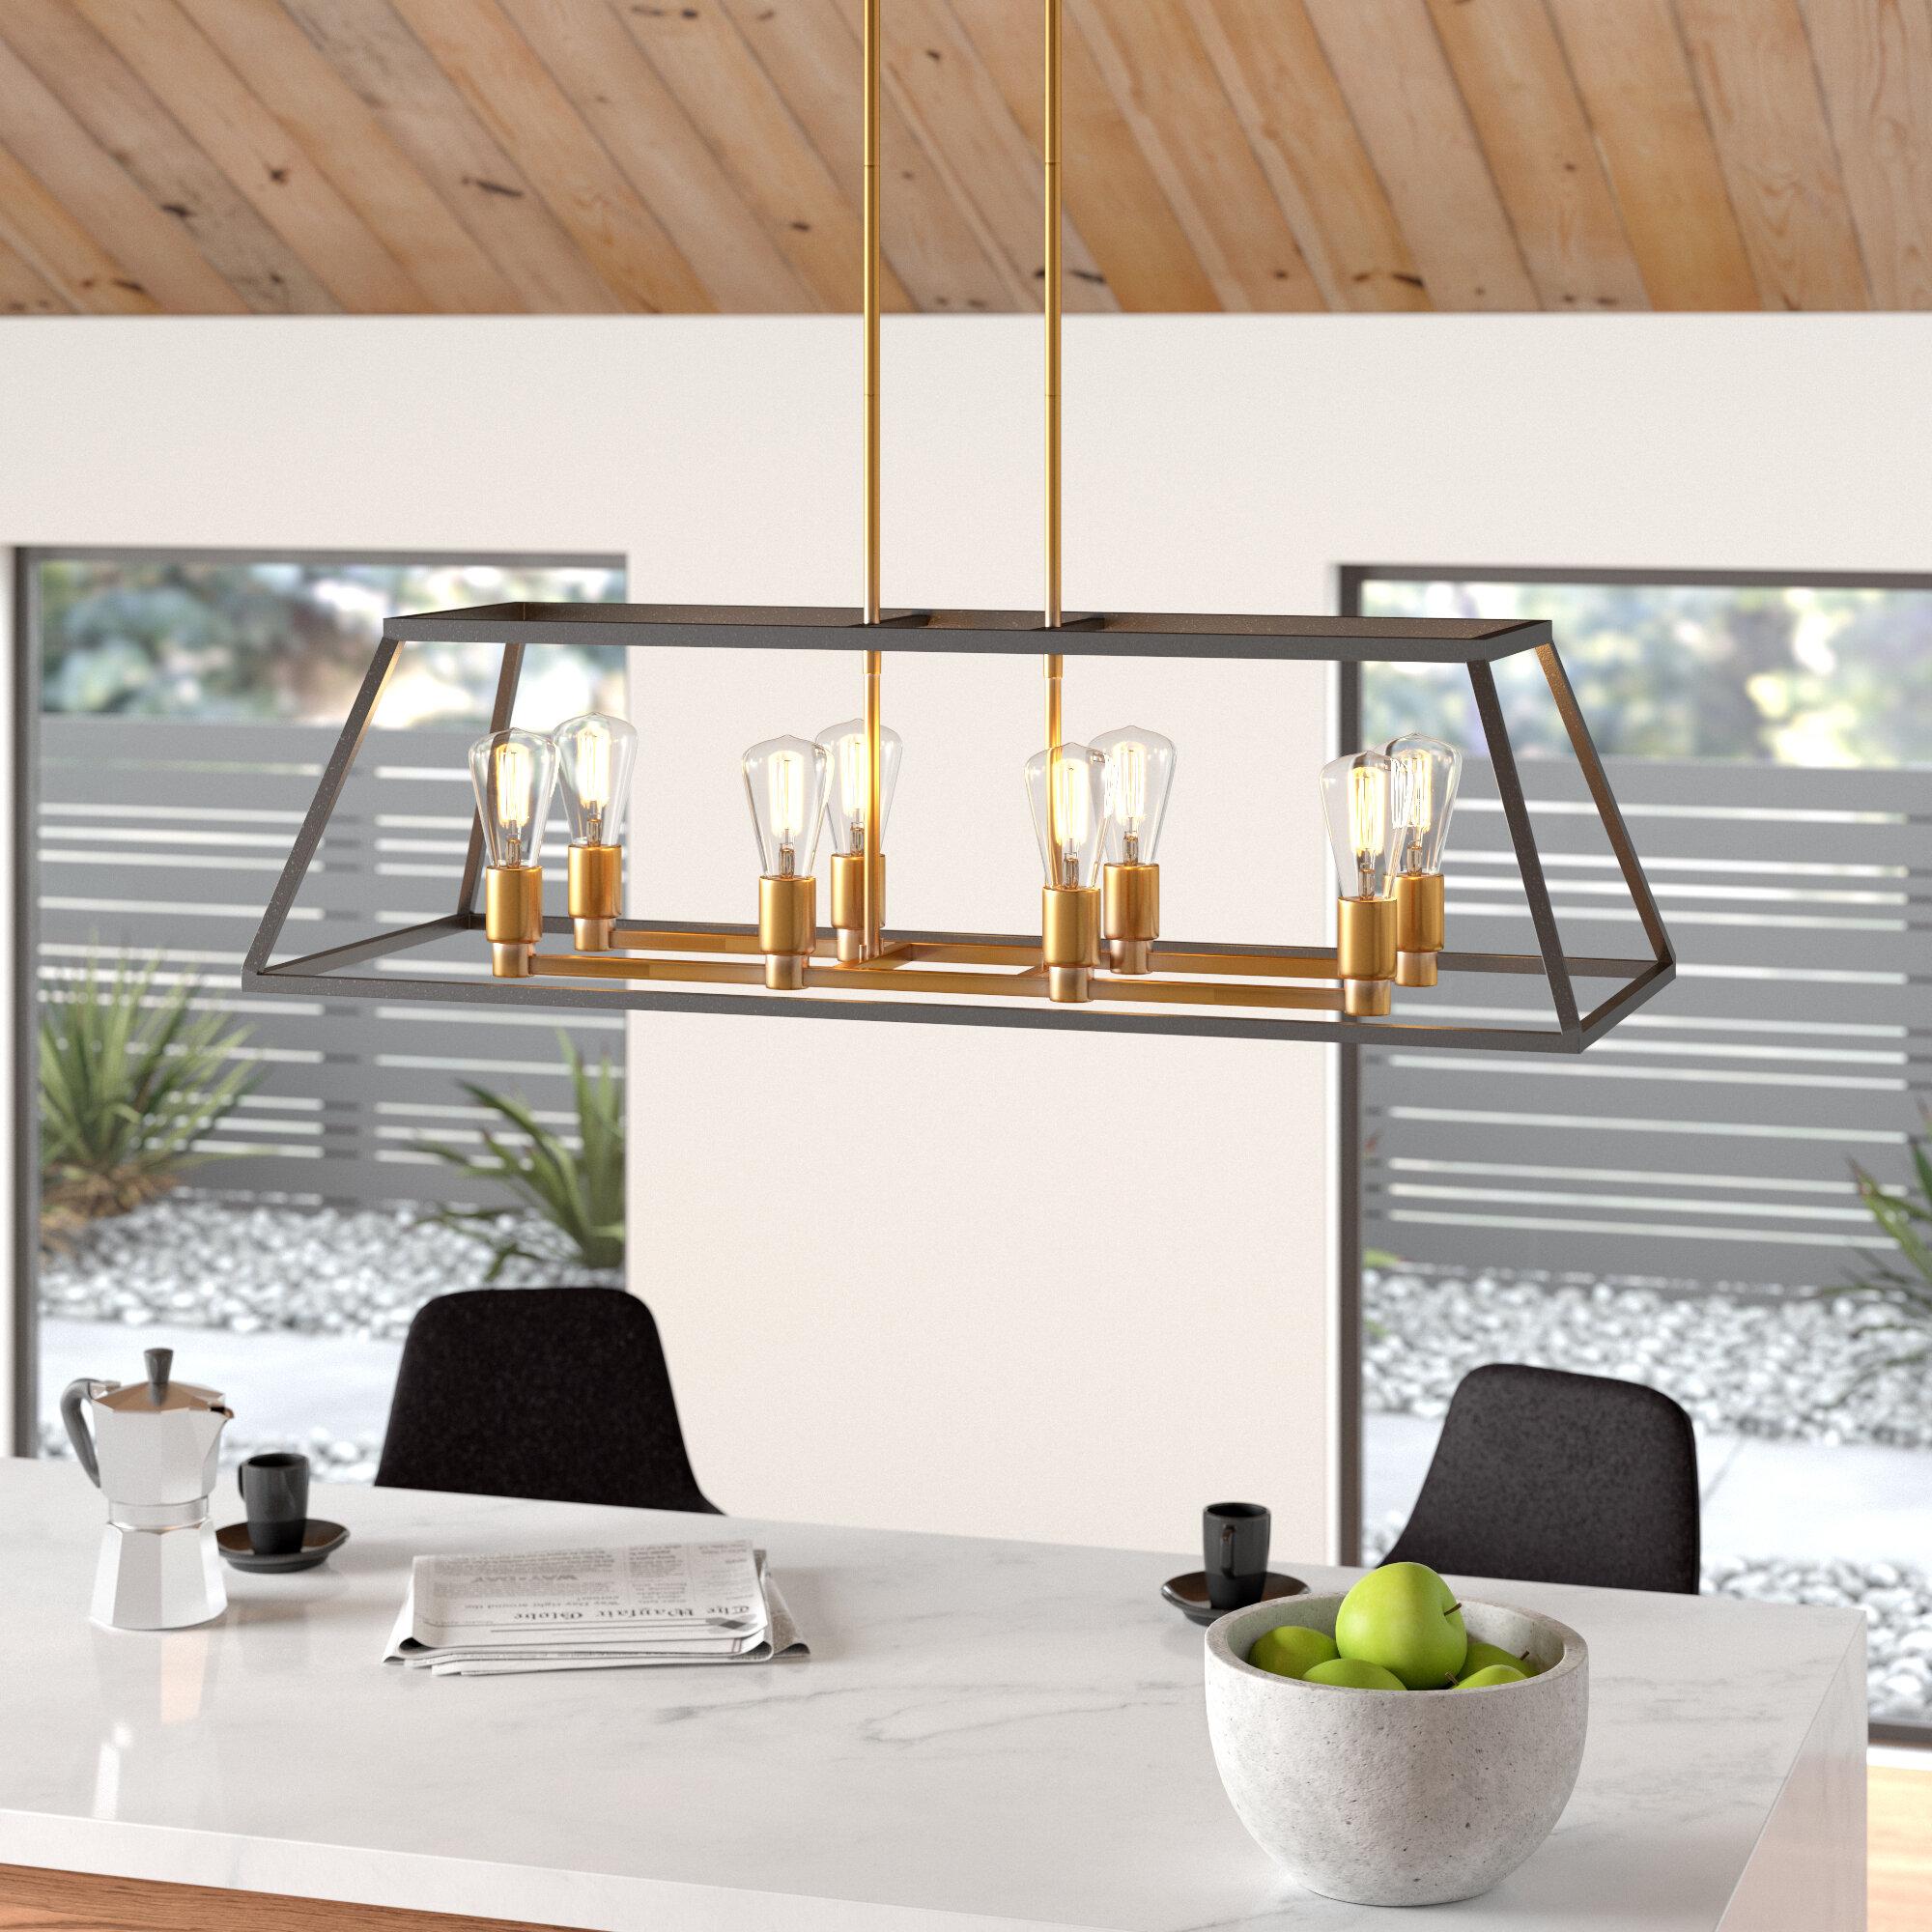 Modern 7 10 Pendant Lighting   Allmodern With Regard To Neal 9 Light Kitchen Island Teardrop Pendants (View 11 of 30)